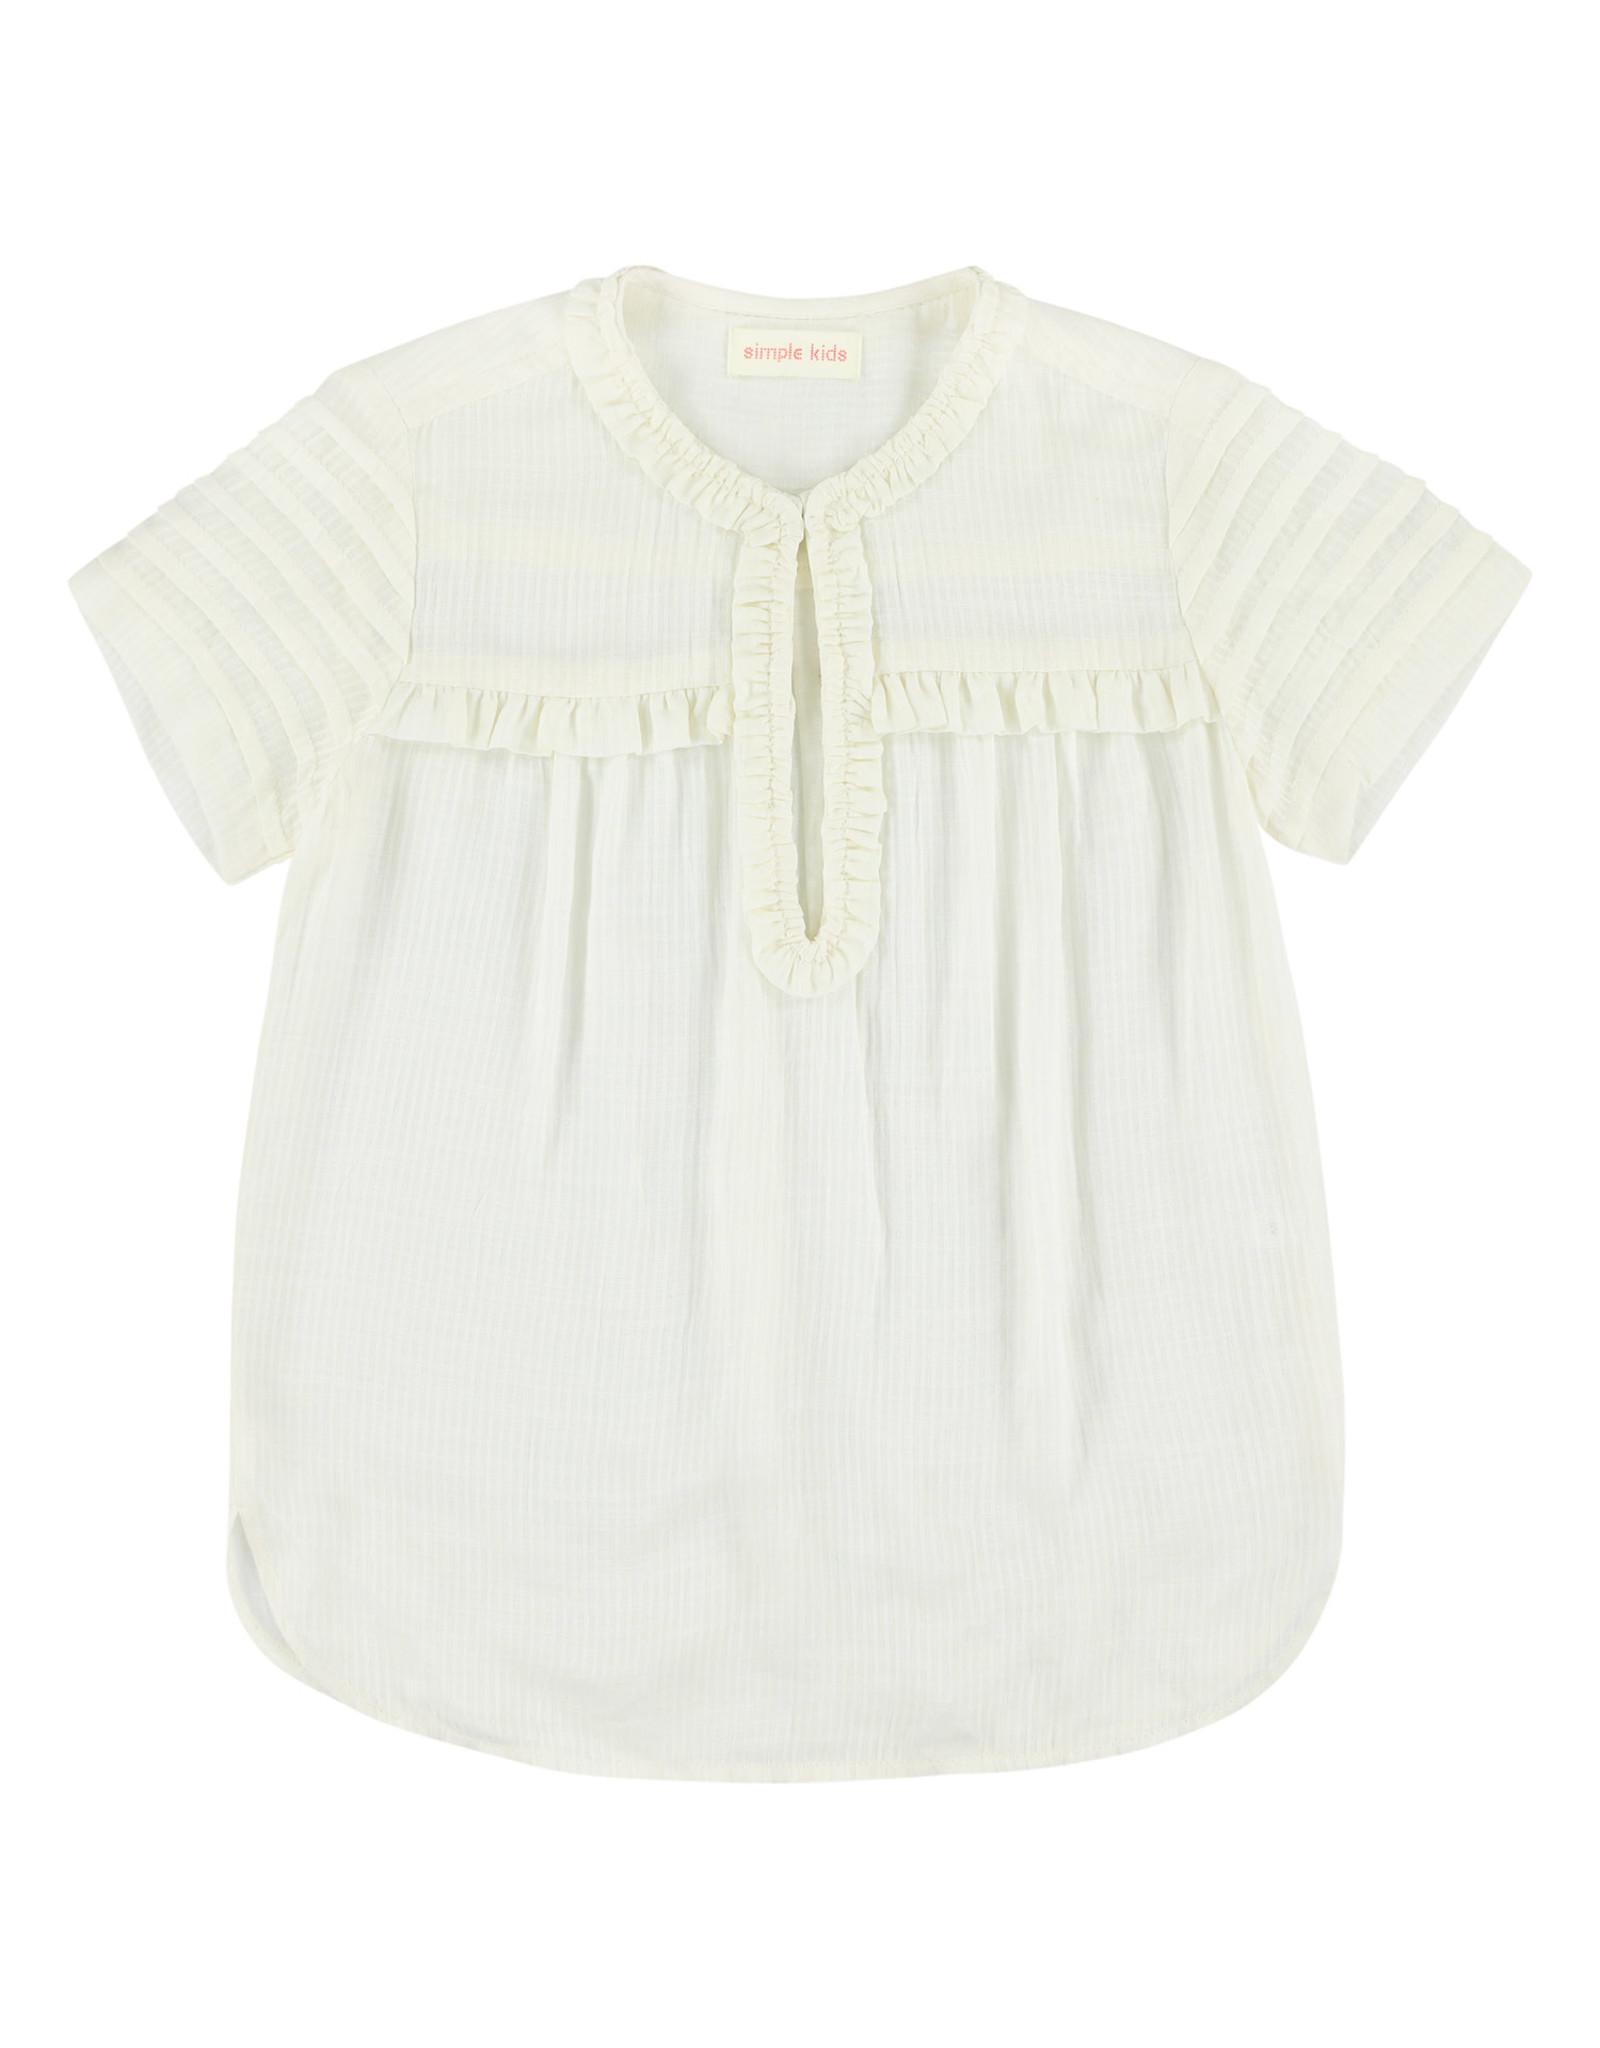 Simple Kids SS21 Cat modrib white shirt